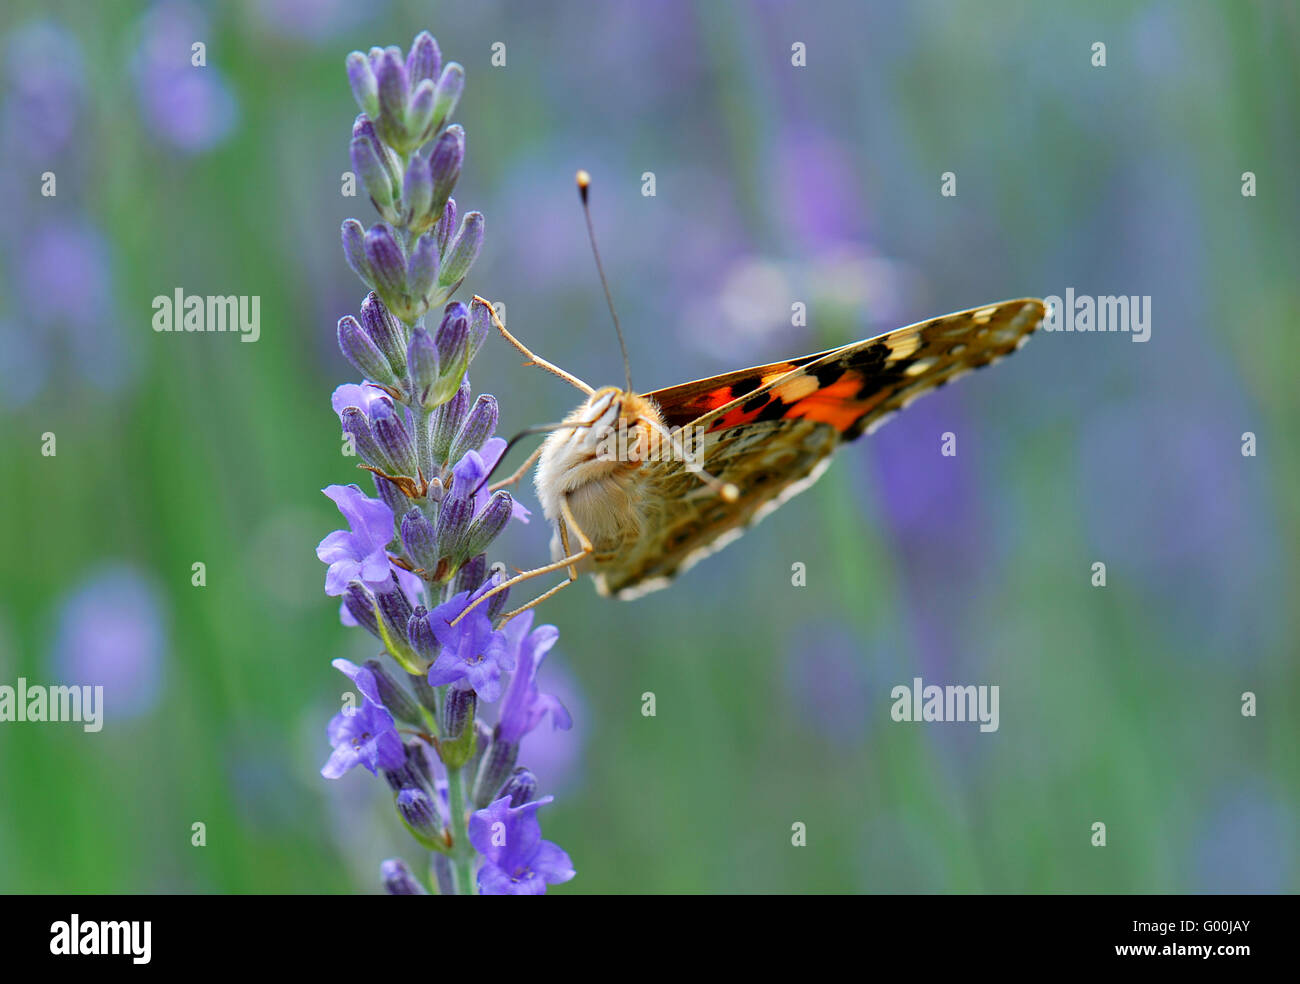 Schmetterling auf Lavendel - Stock Image